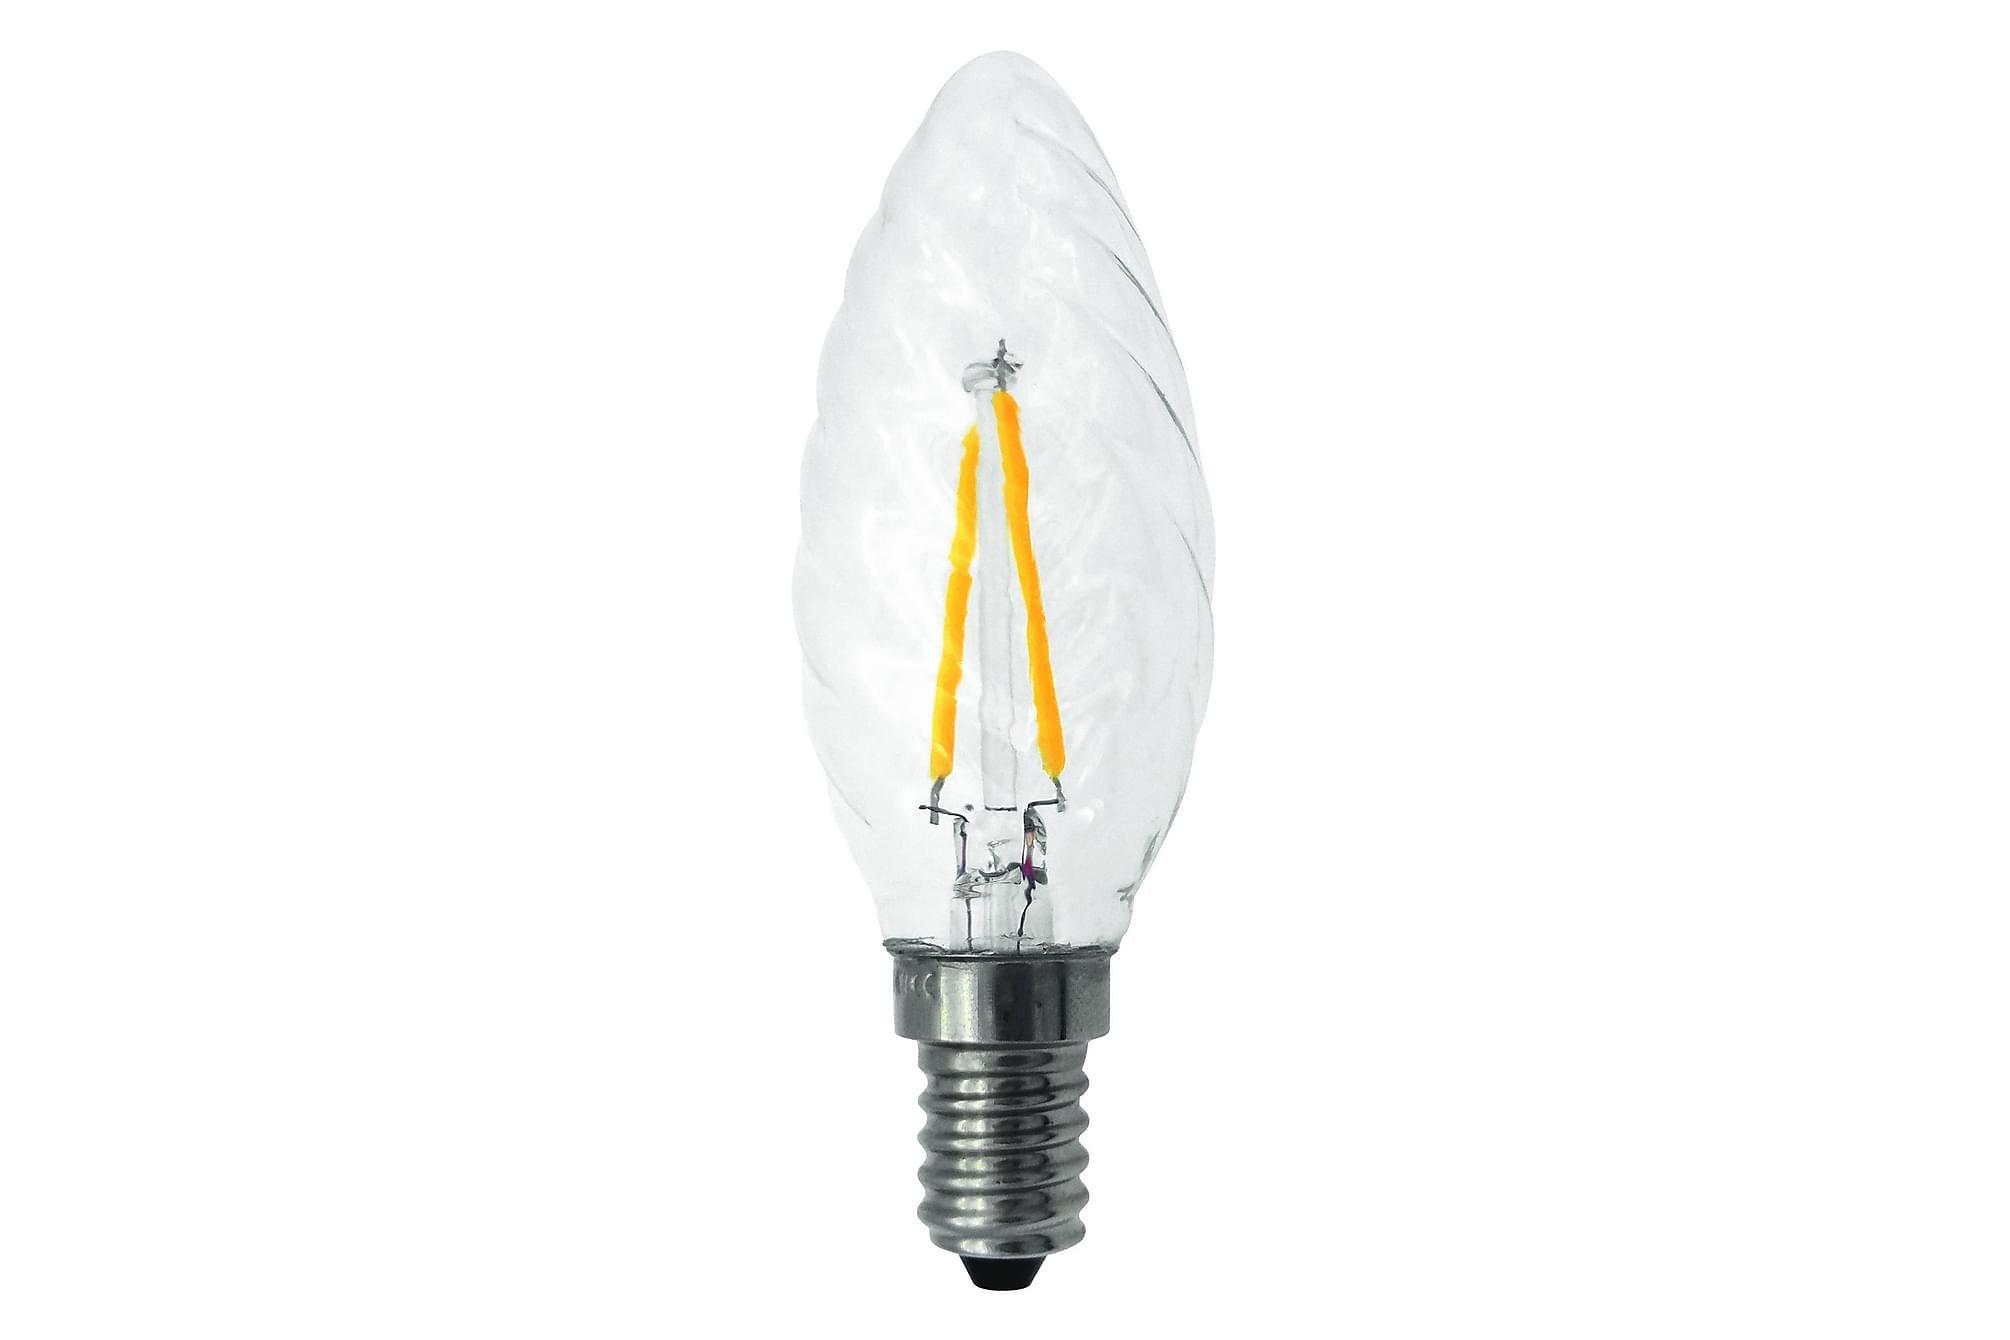 JUNG LED-lampa 1,8W E14 2700K Filament, Glödlampor & ljuskällor